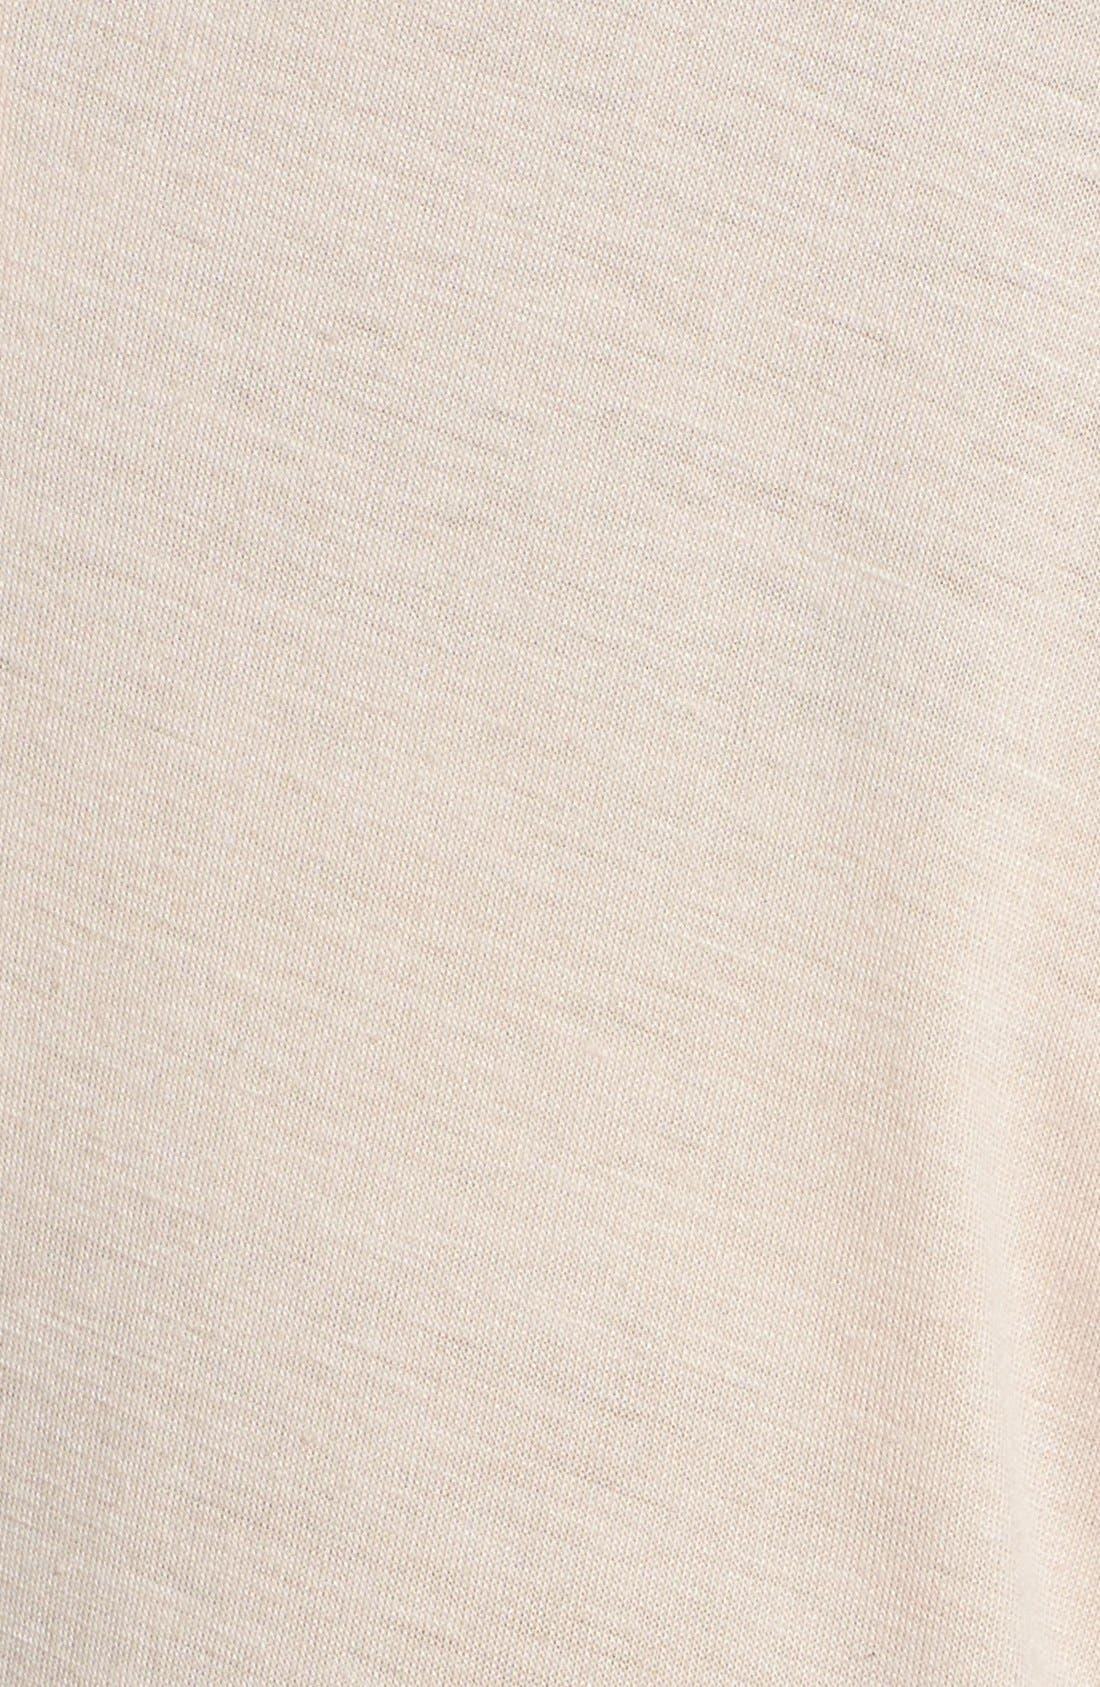 Alternate Image 3  - Ten Sixty Sherman A-Line Midi Skirt (Juniors) (Online Only)